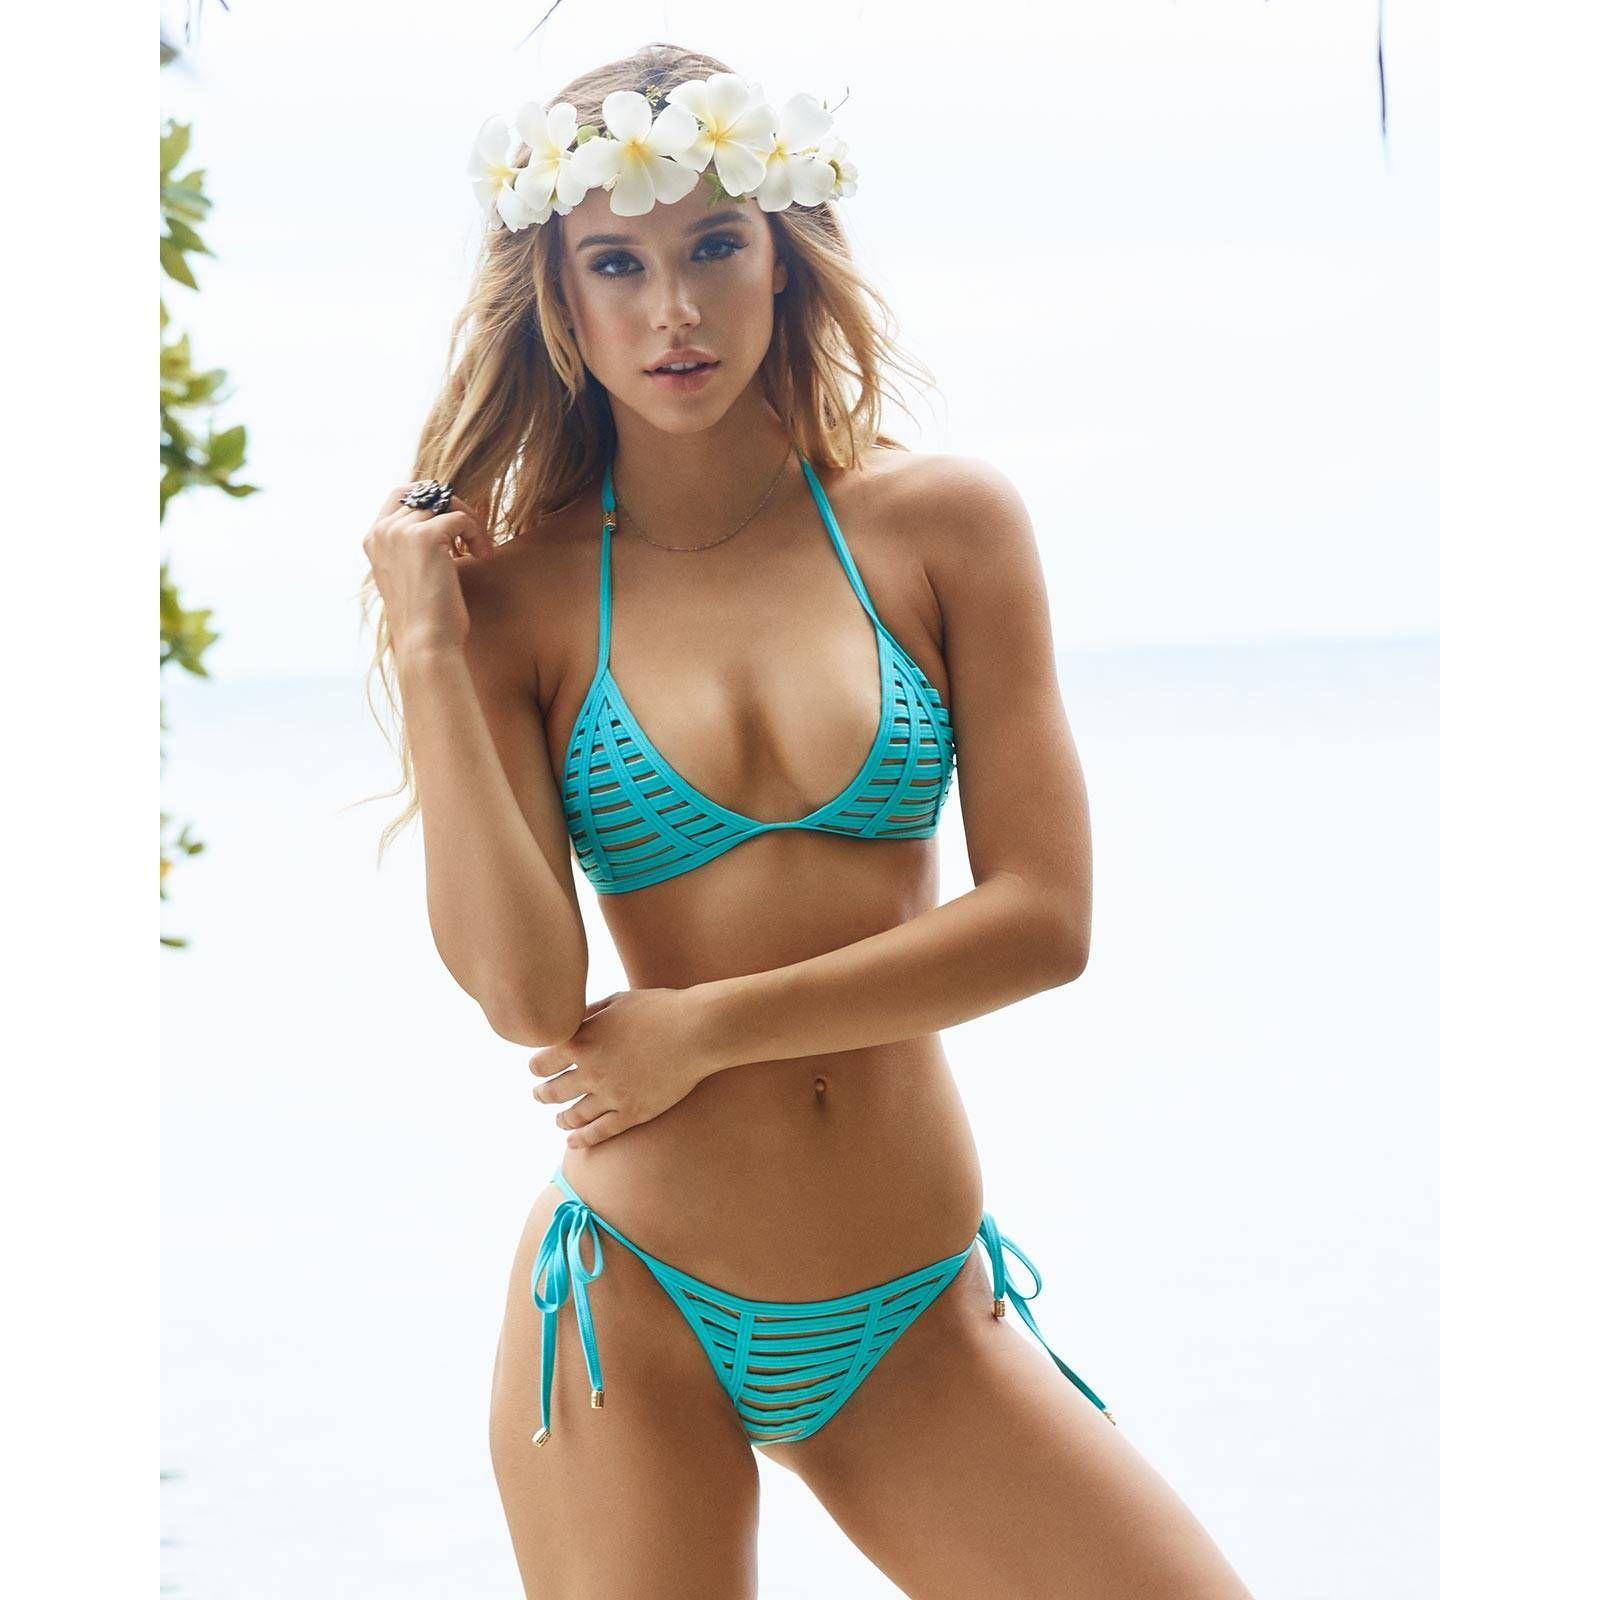 Beach Bunny 2017: HARD SUMMER AQUA TRIANGLE TIE SIDE BIKINI { B16104T1-AQUA-